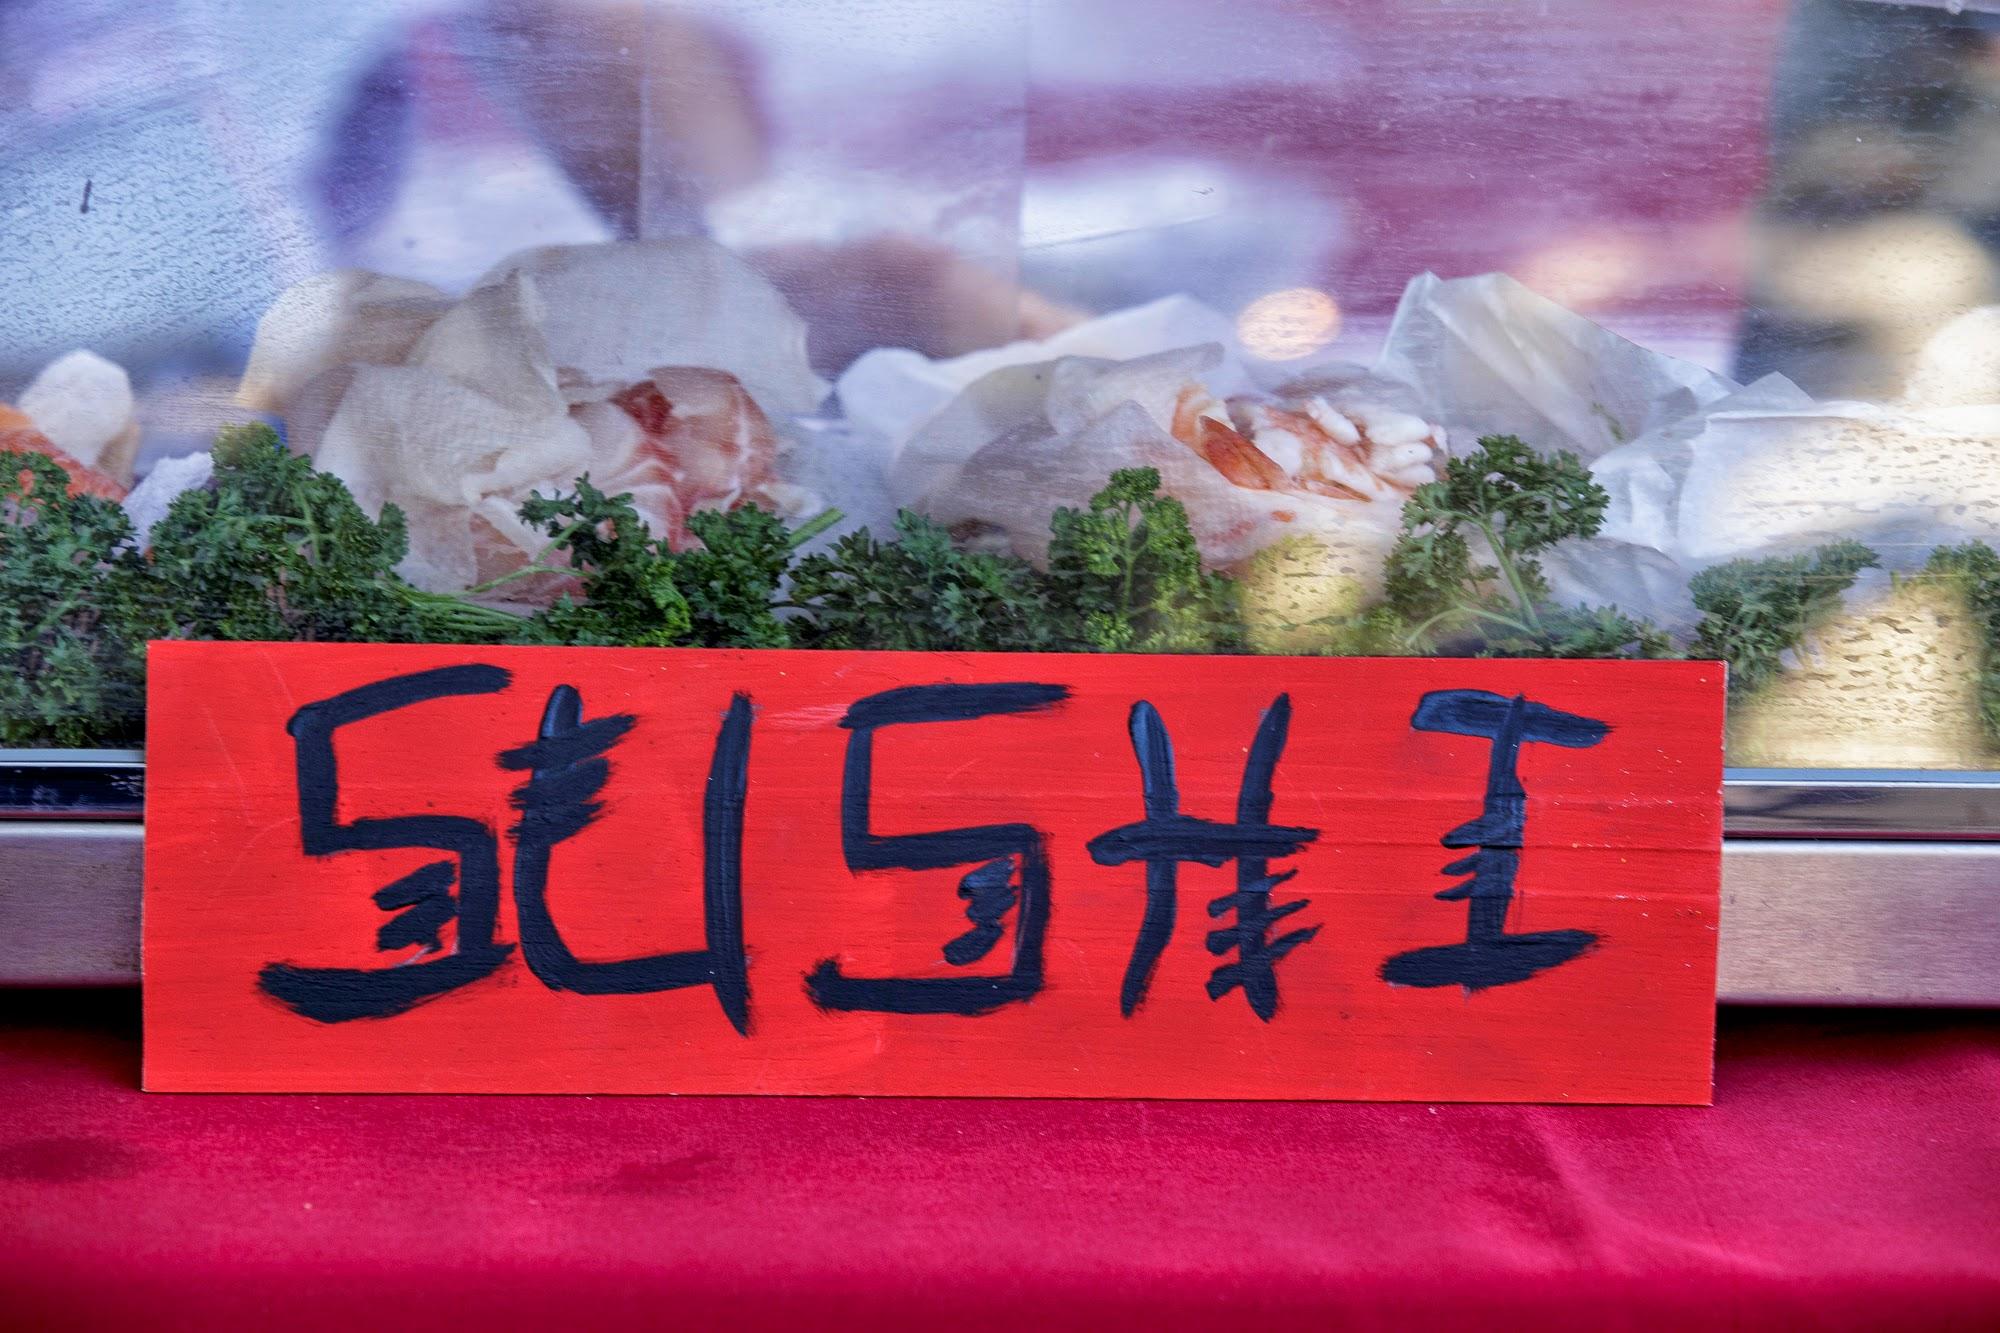 000 - Asian Felici sushi.jpeg